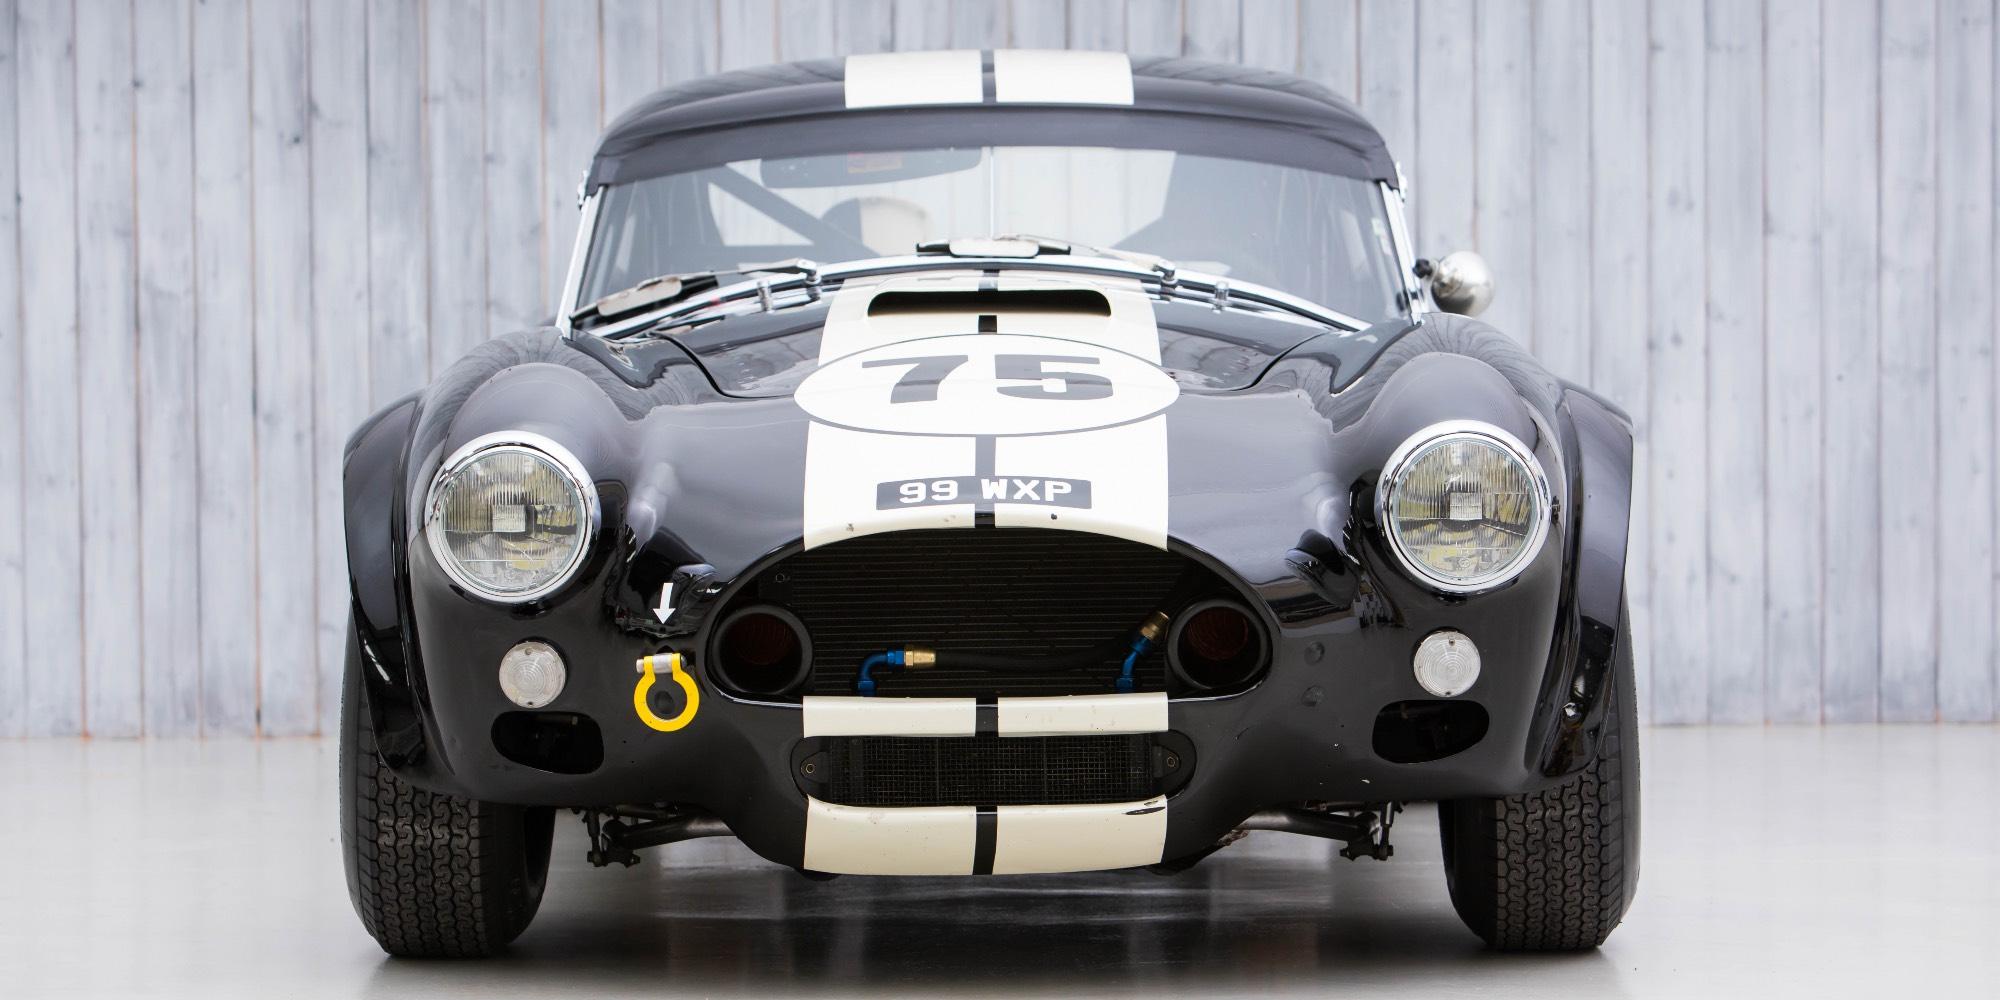 The Multiple Championship Winning 1964 Shelby Cobra 289